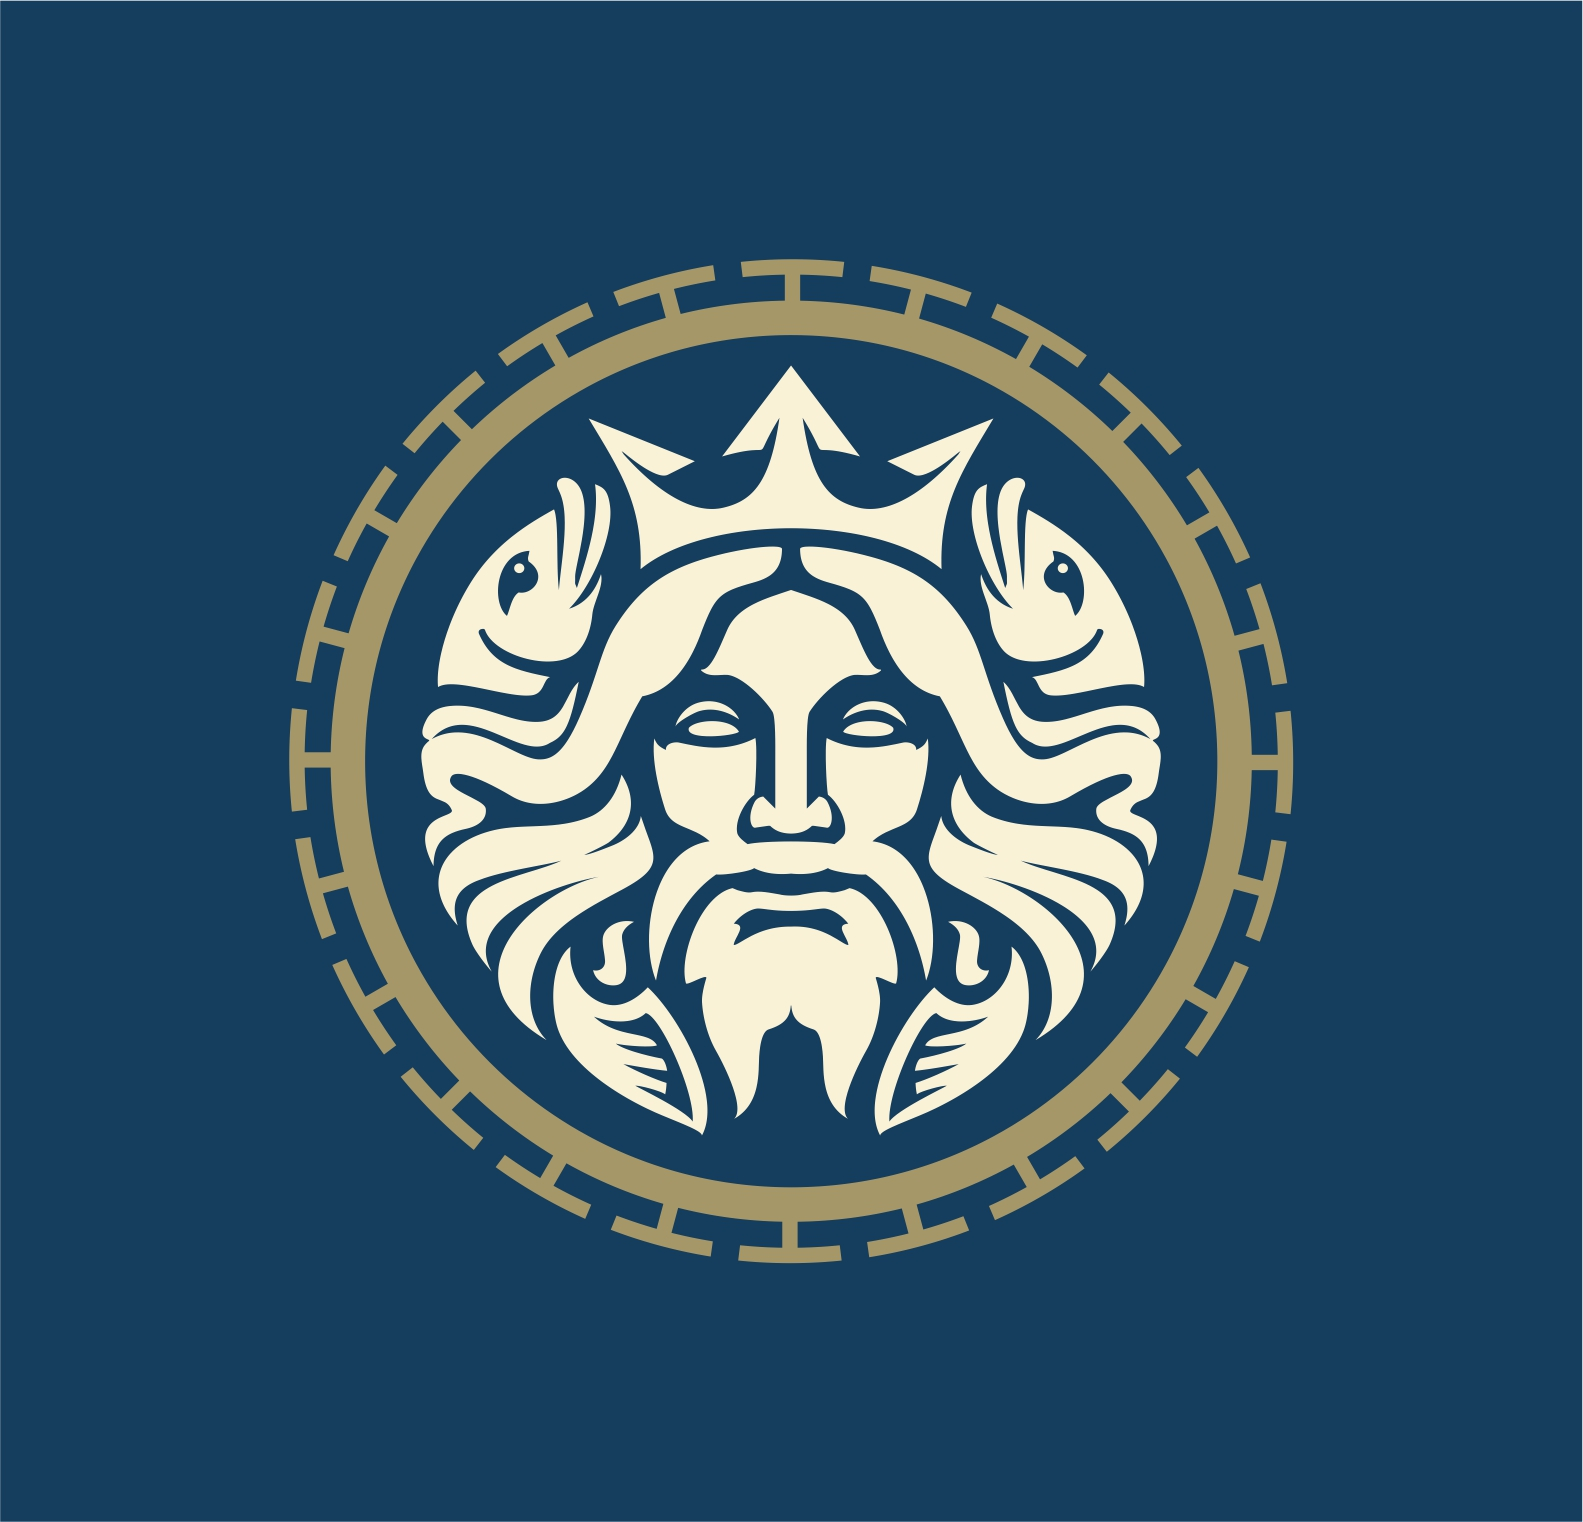 Modern Poseidon / Neptune logo.   Logo s prikazom Posejdona / Neptuna.